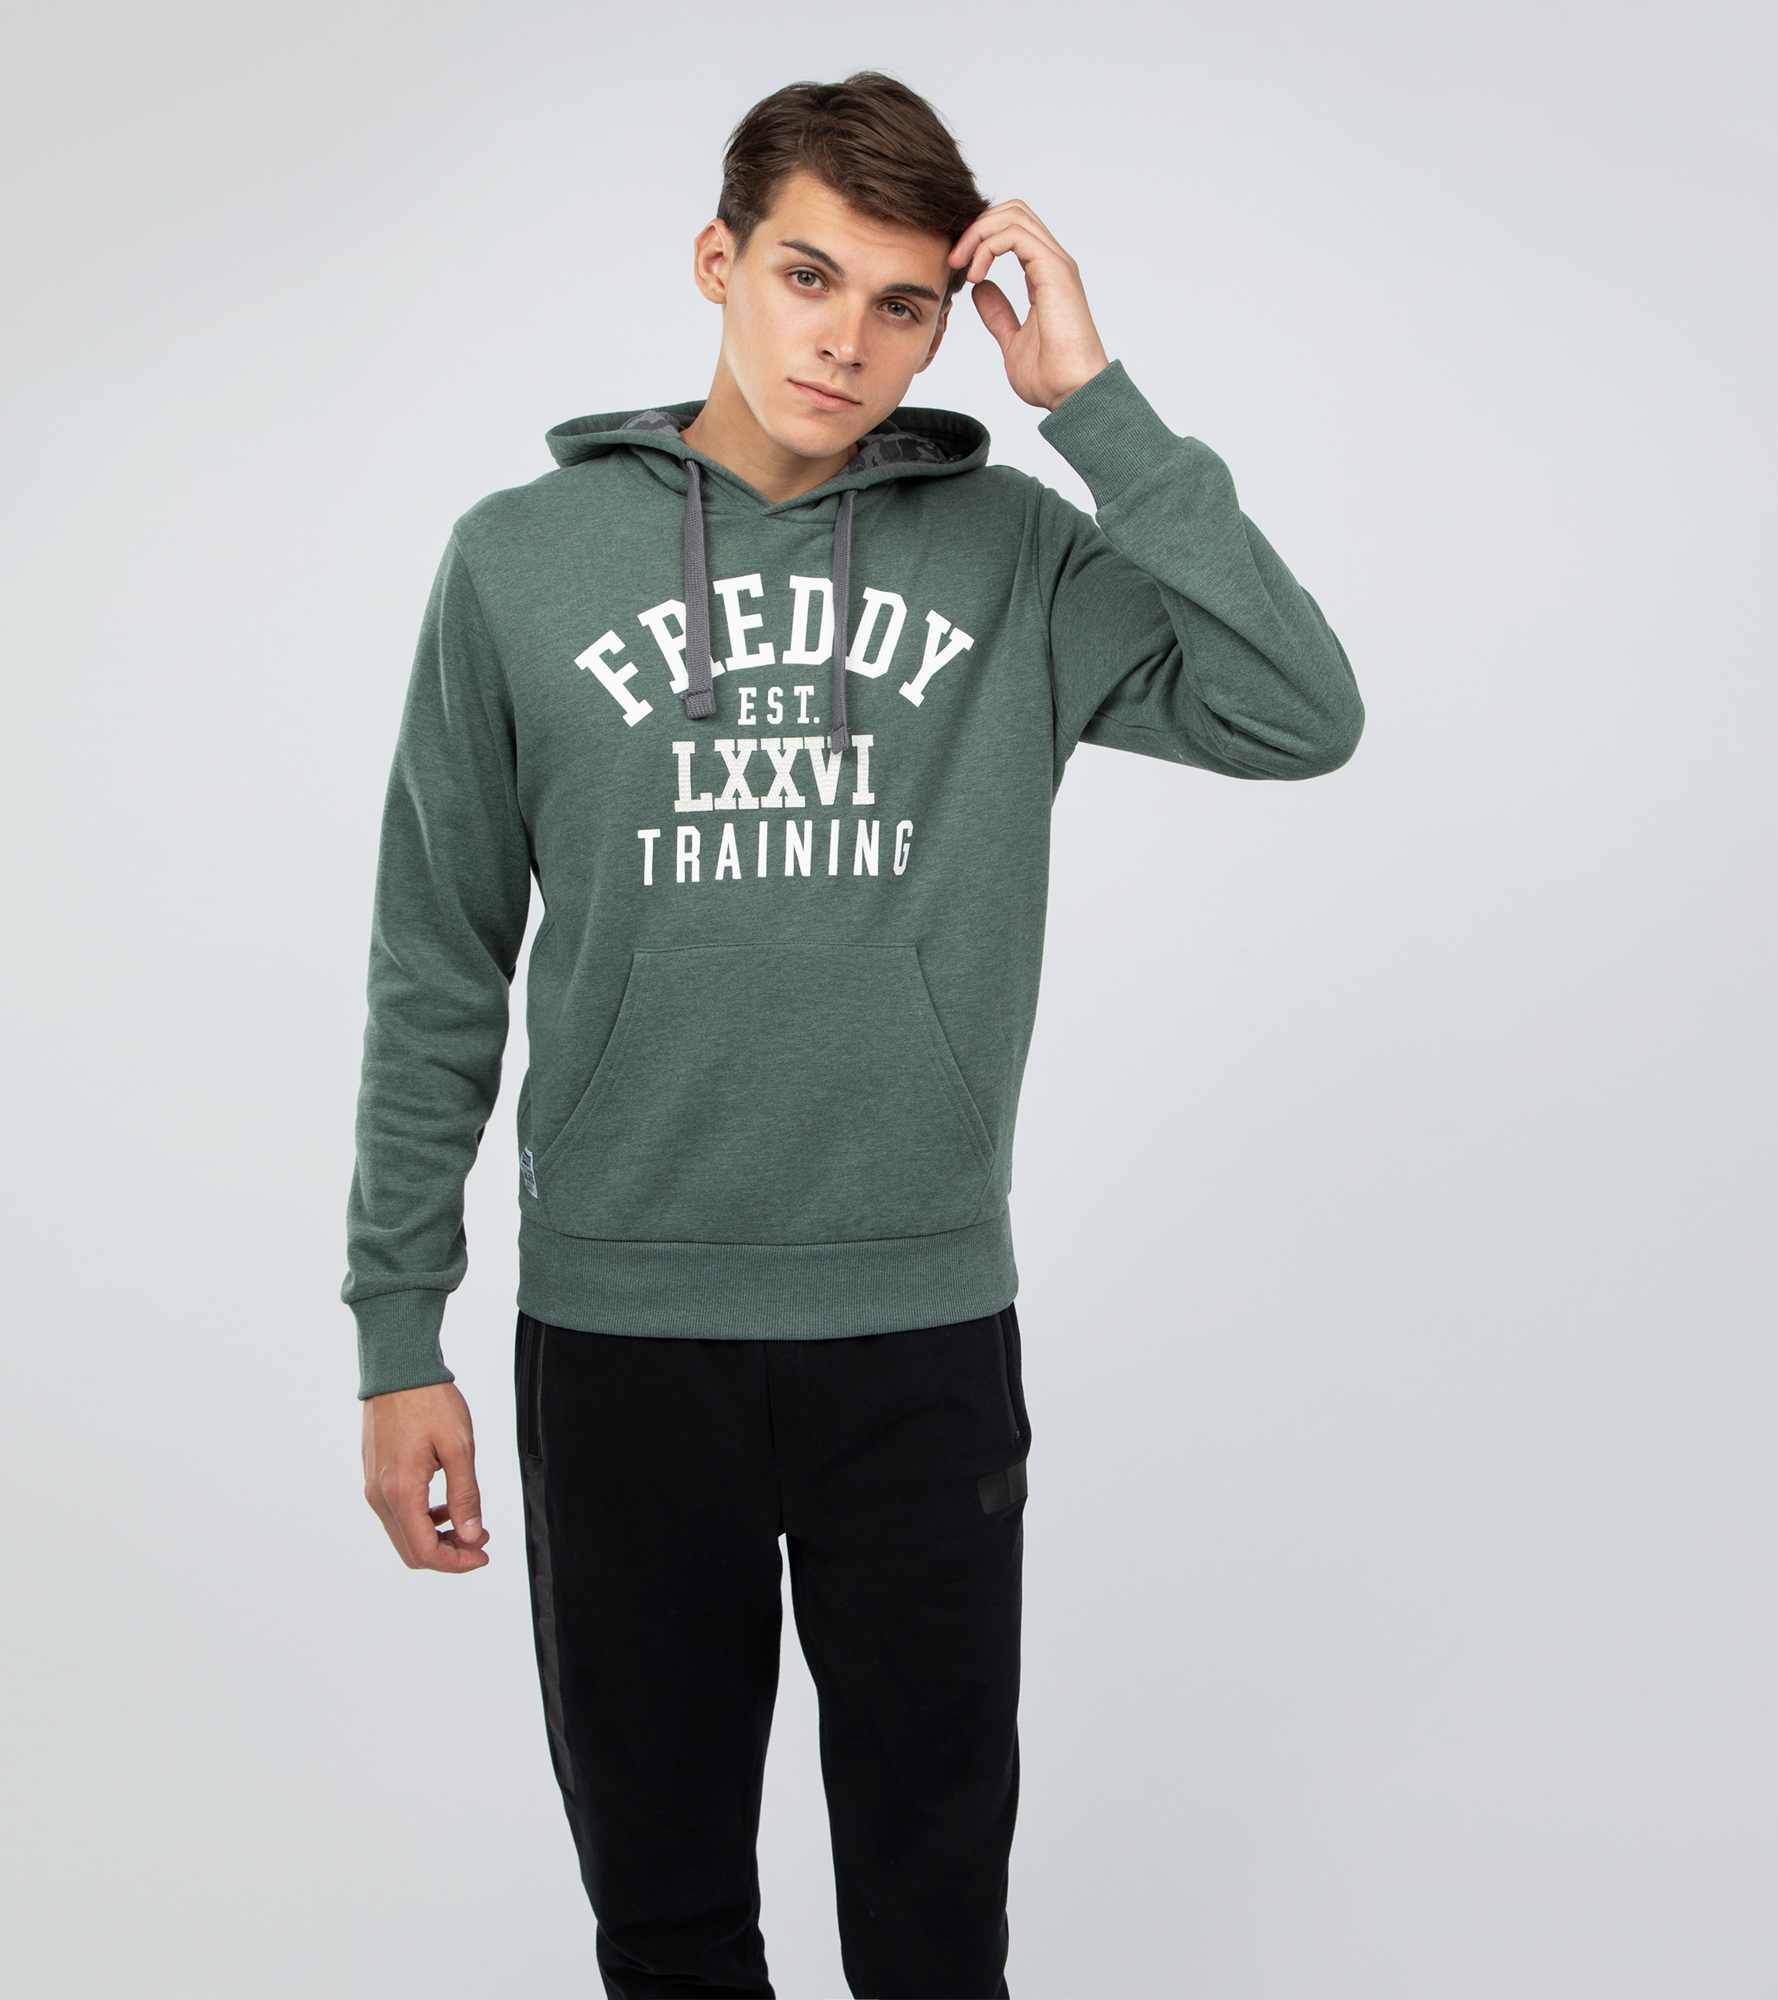 Freddy Худи мужская Freddy, размер 52-54 недорго, оригинальная цена